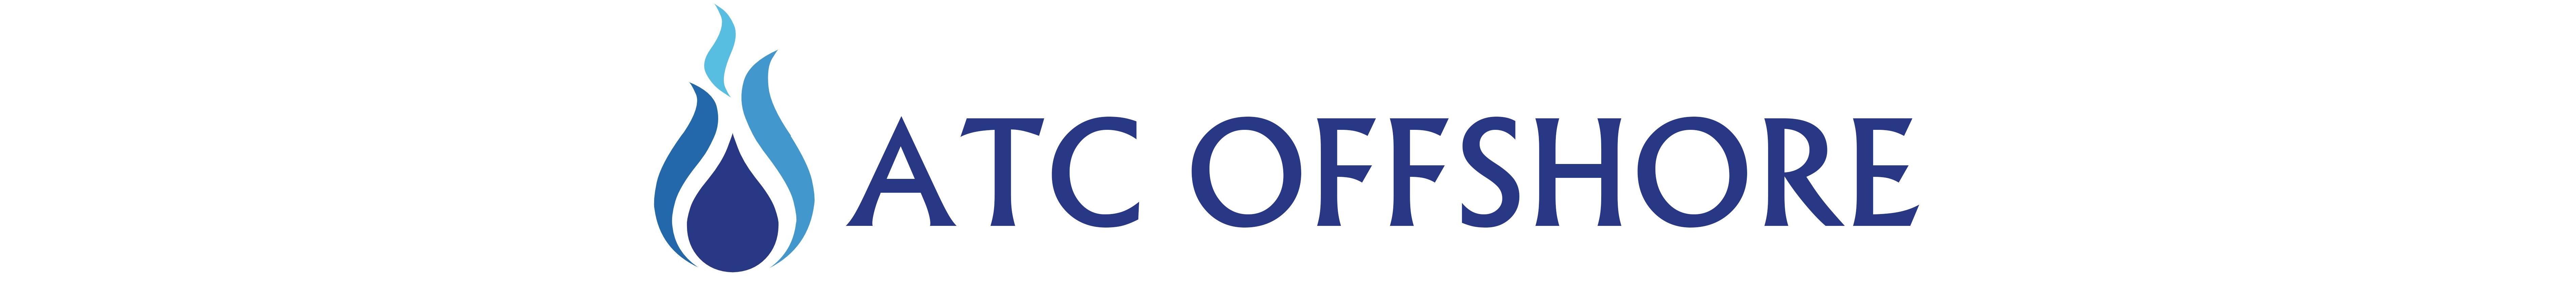 ATC OFFSHORE